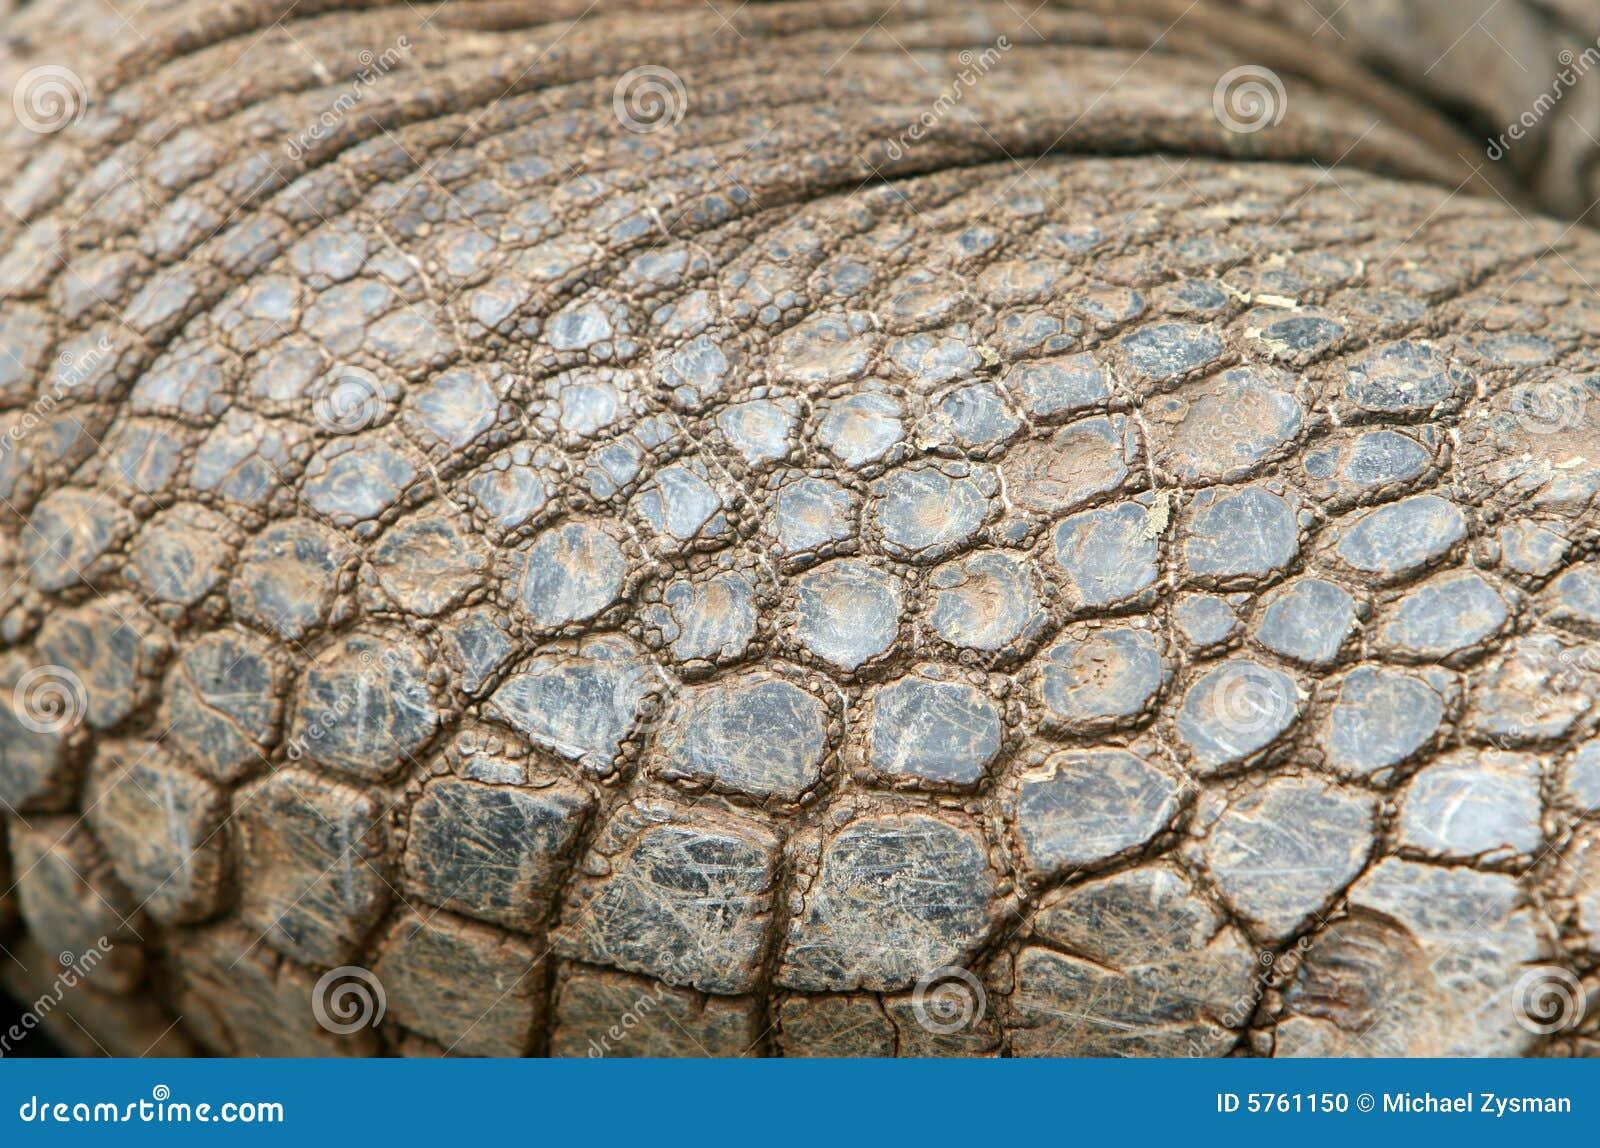 Giant Galapagos Tortoise Skin Stock Photo - Image: 5761150